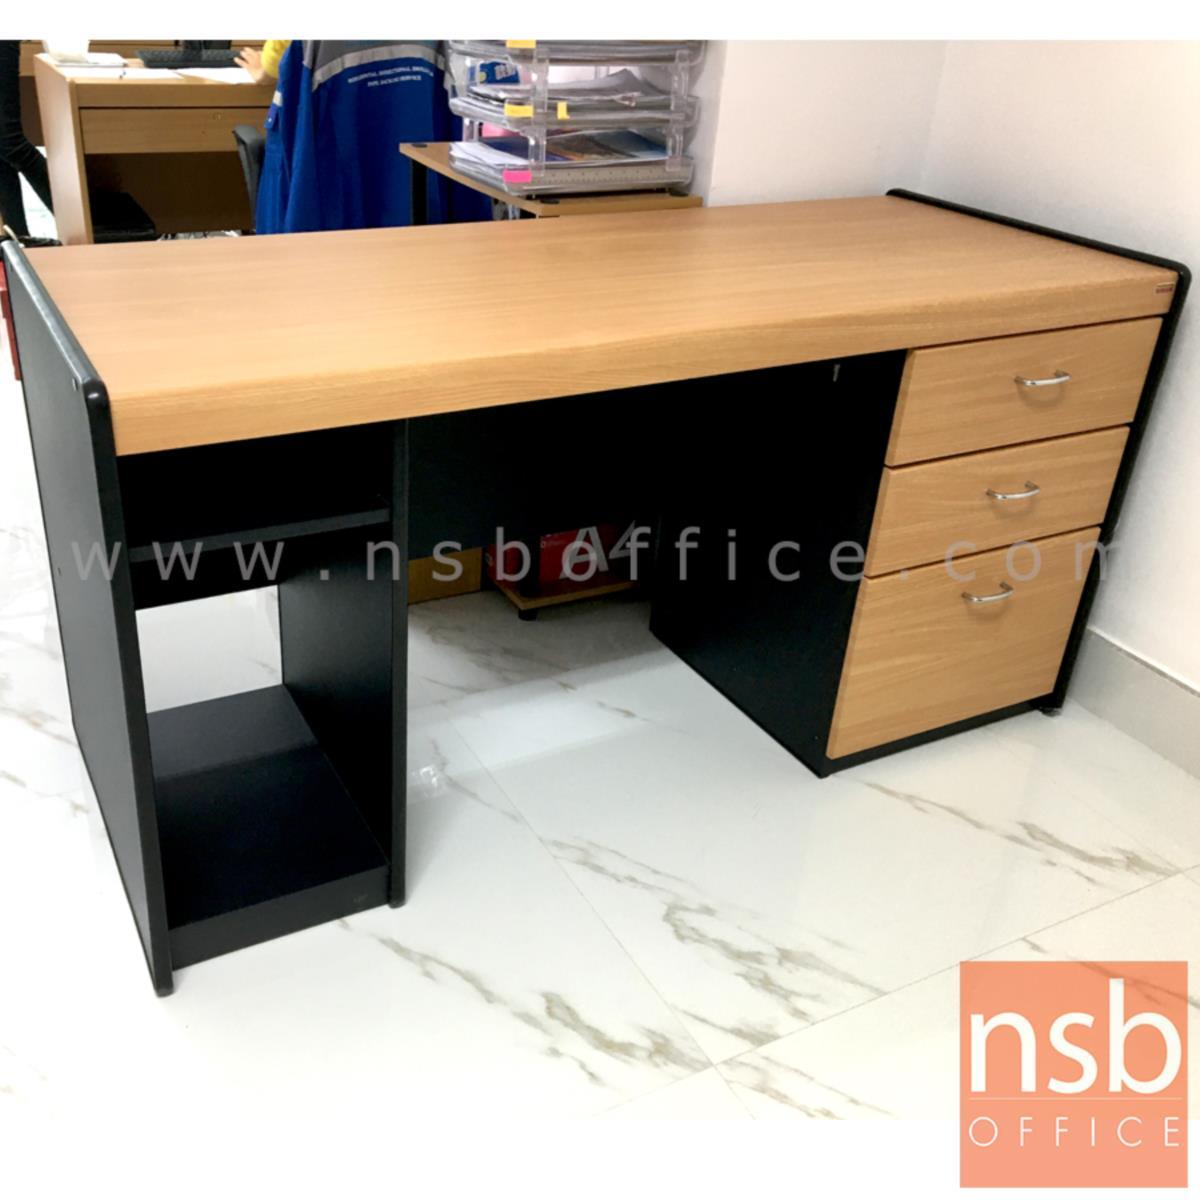 A01A020:โต๊ะคอมพิวเตอร์ 3 ลิ้นชัก   ขนาด 150W cm. พร้อมรางคีบอร์ดและที่วางซีพียู